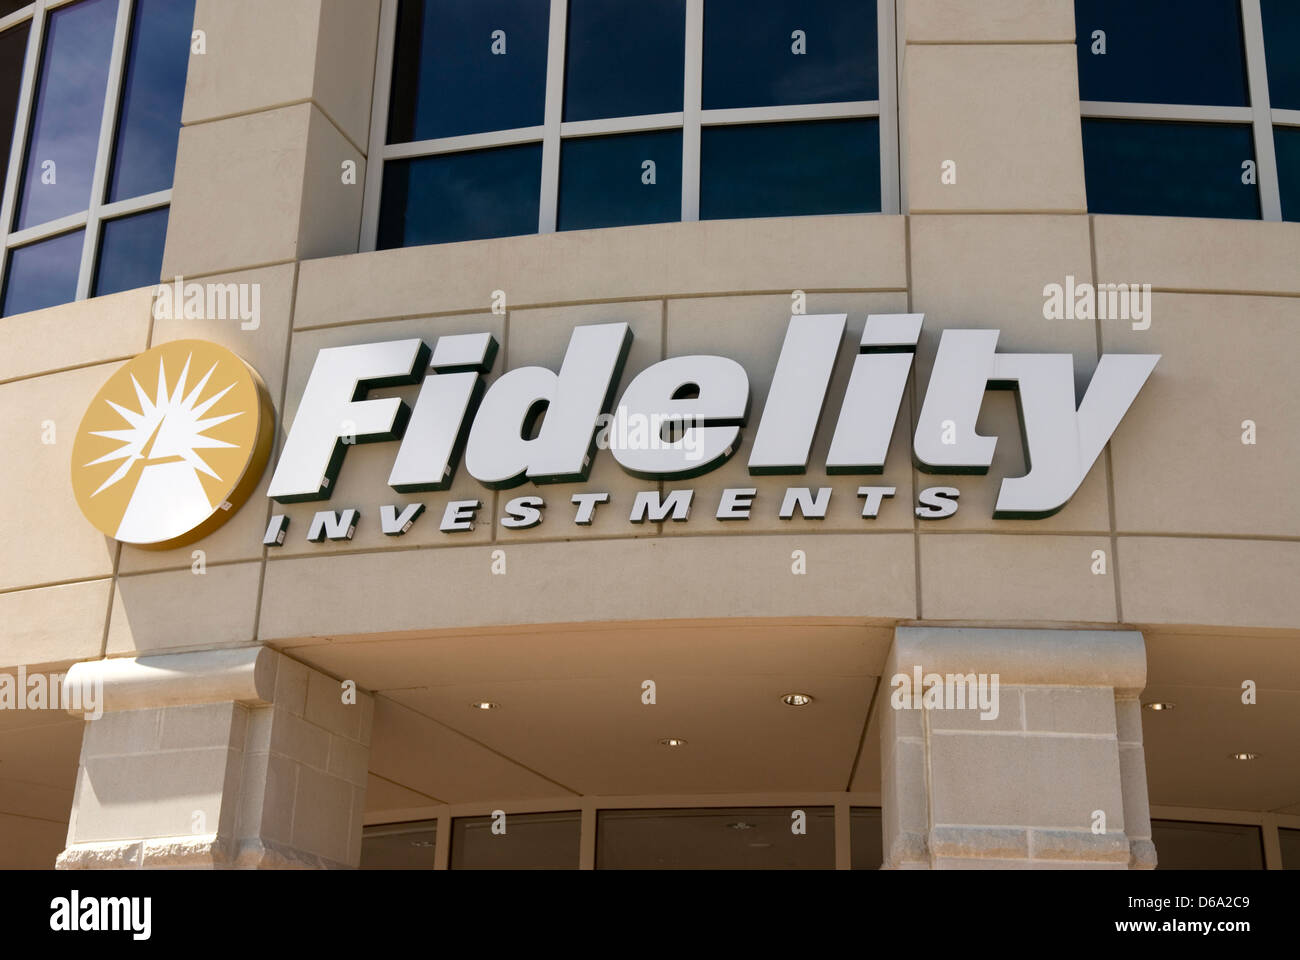 Fidelity Investments Greenville South Carolina  USA - Stock Image